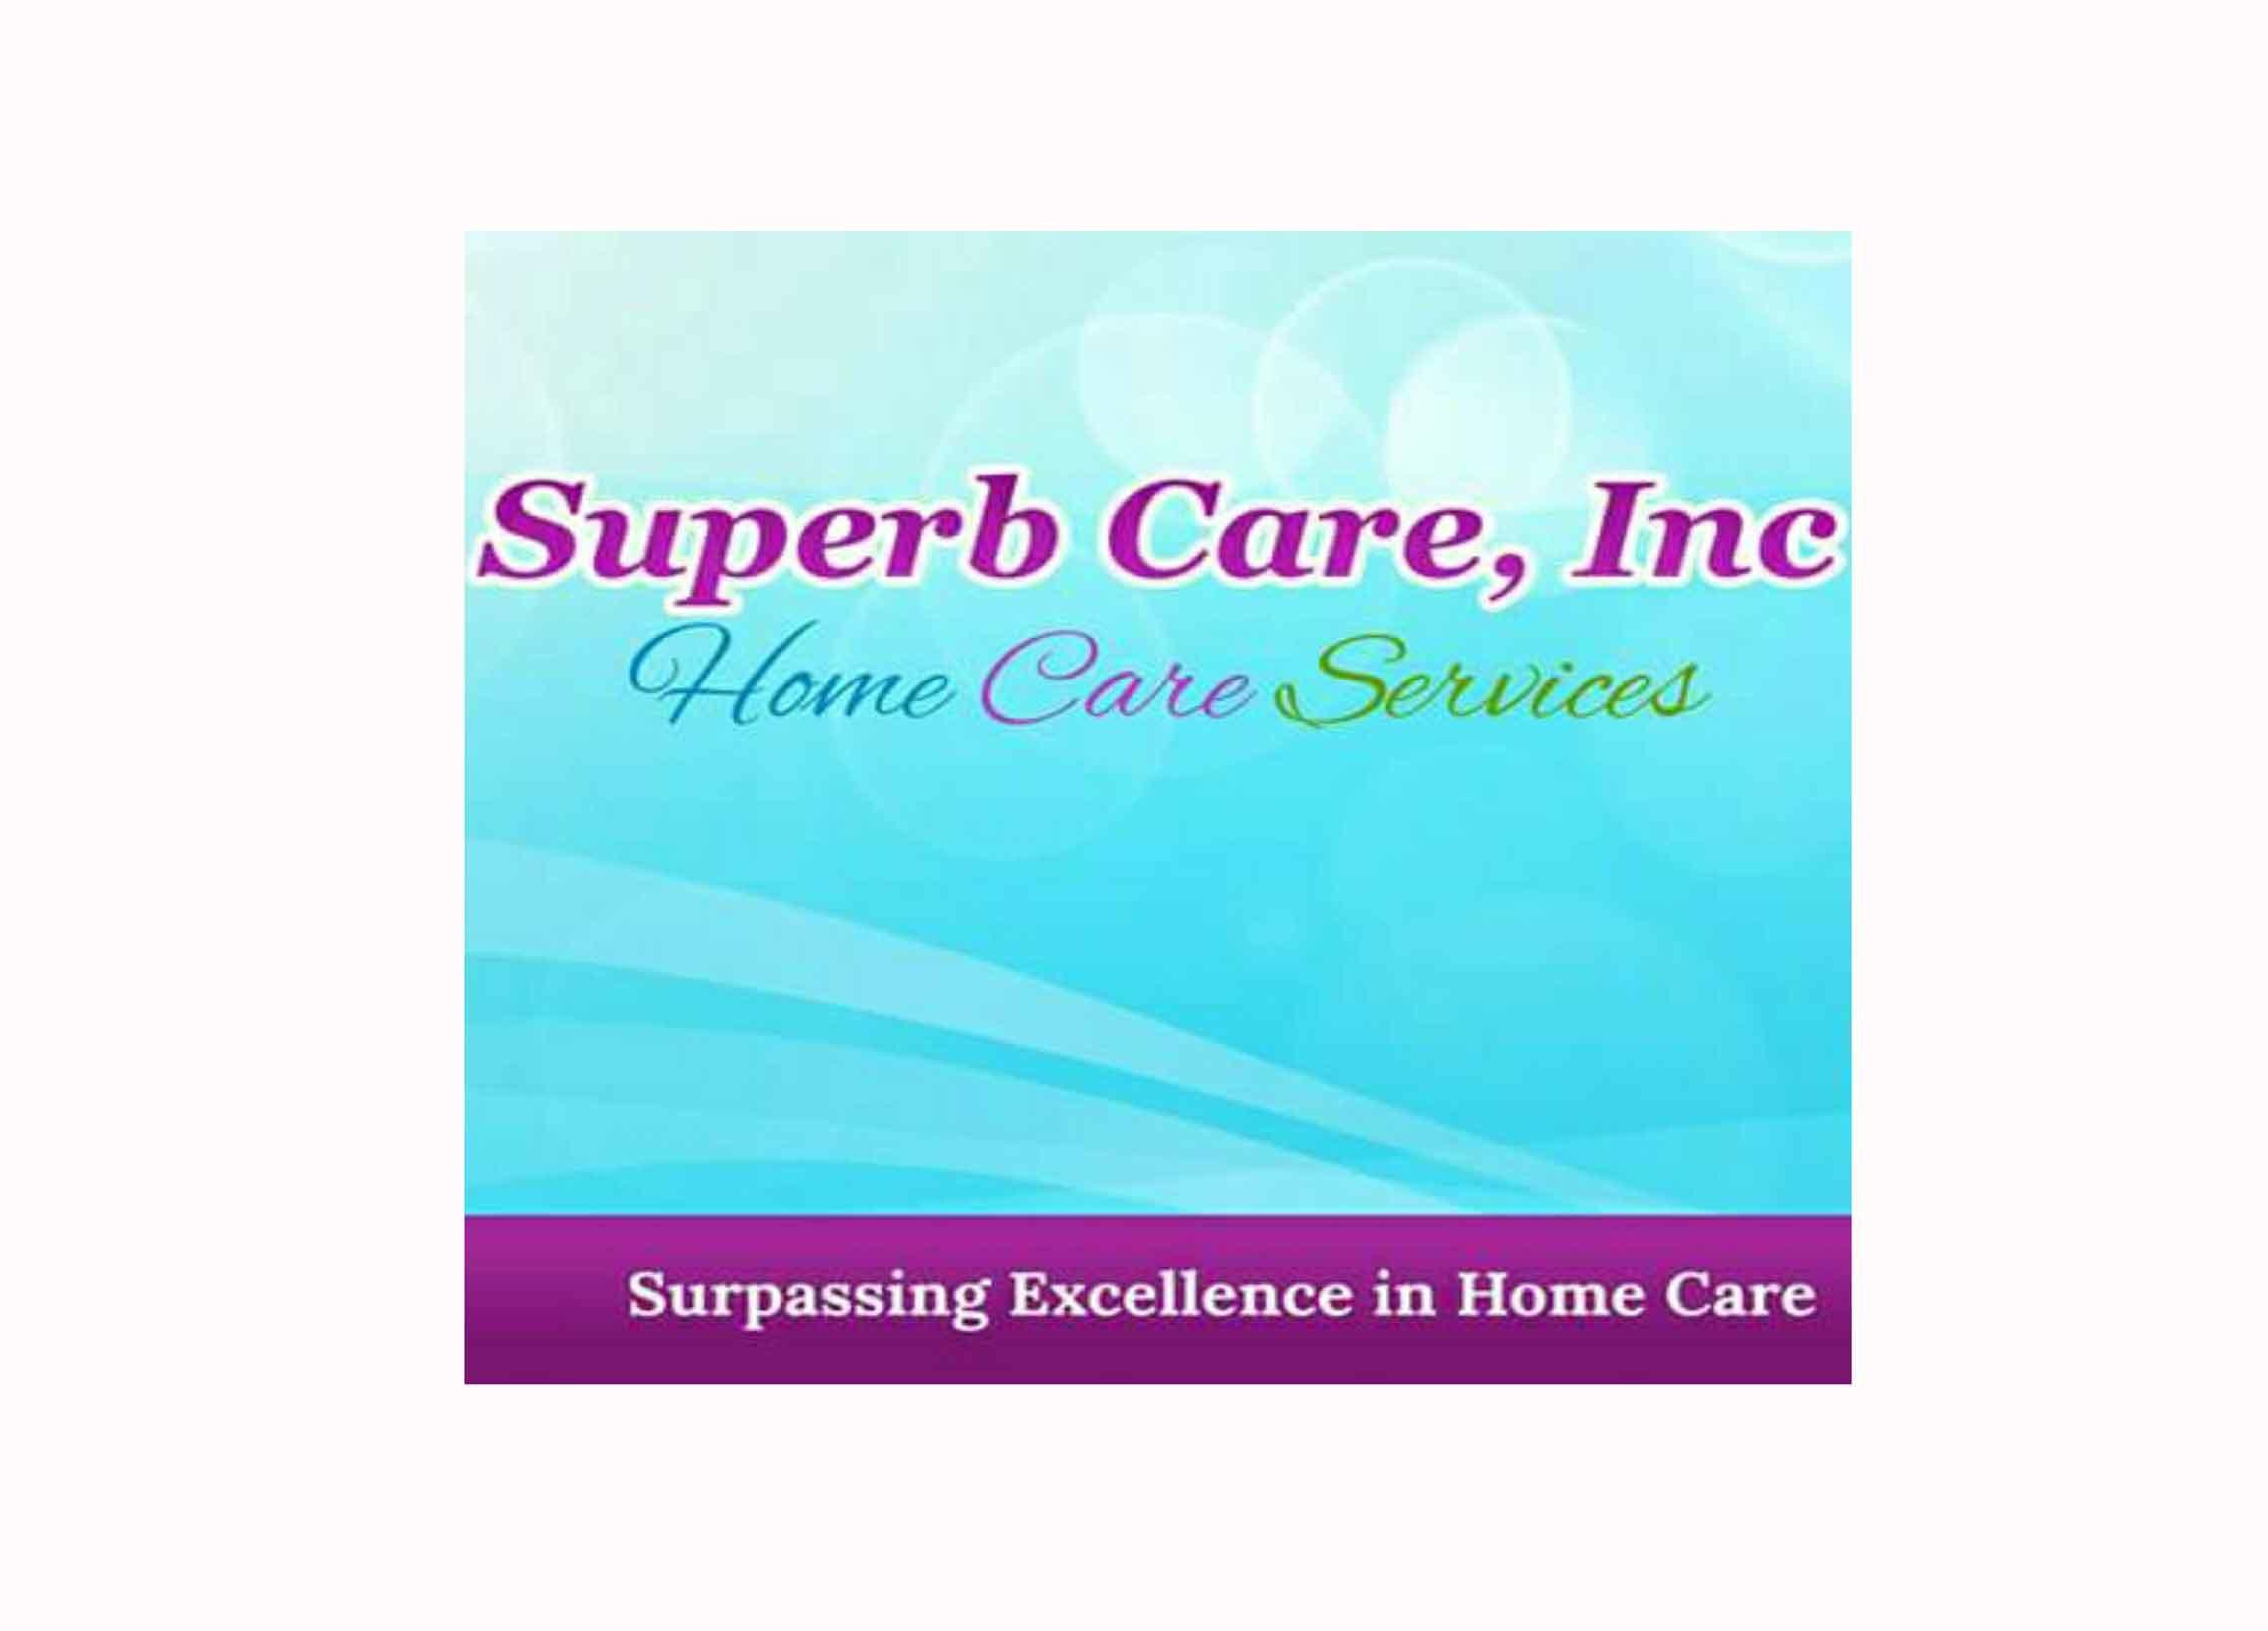 Superb Care Inc